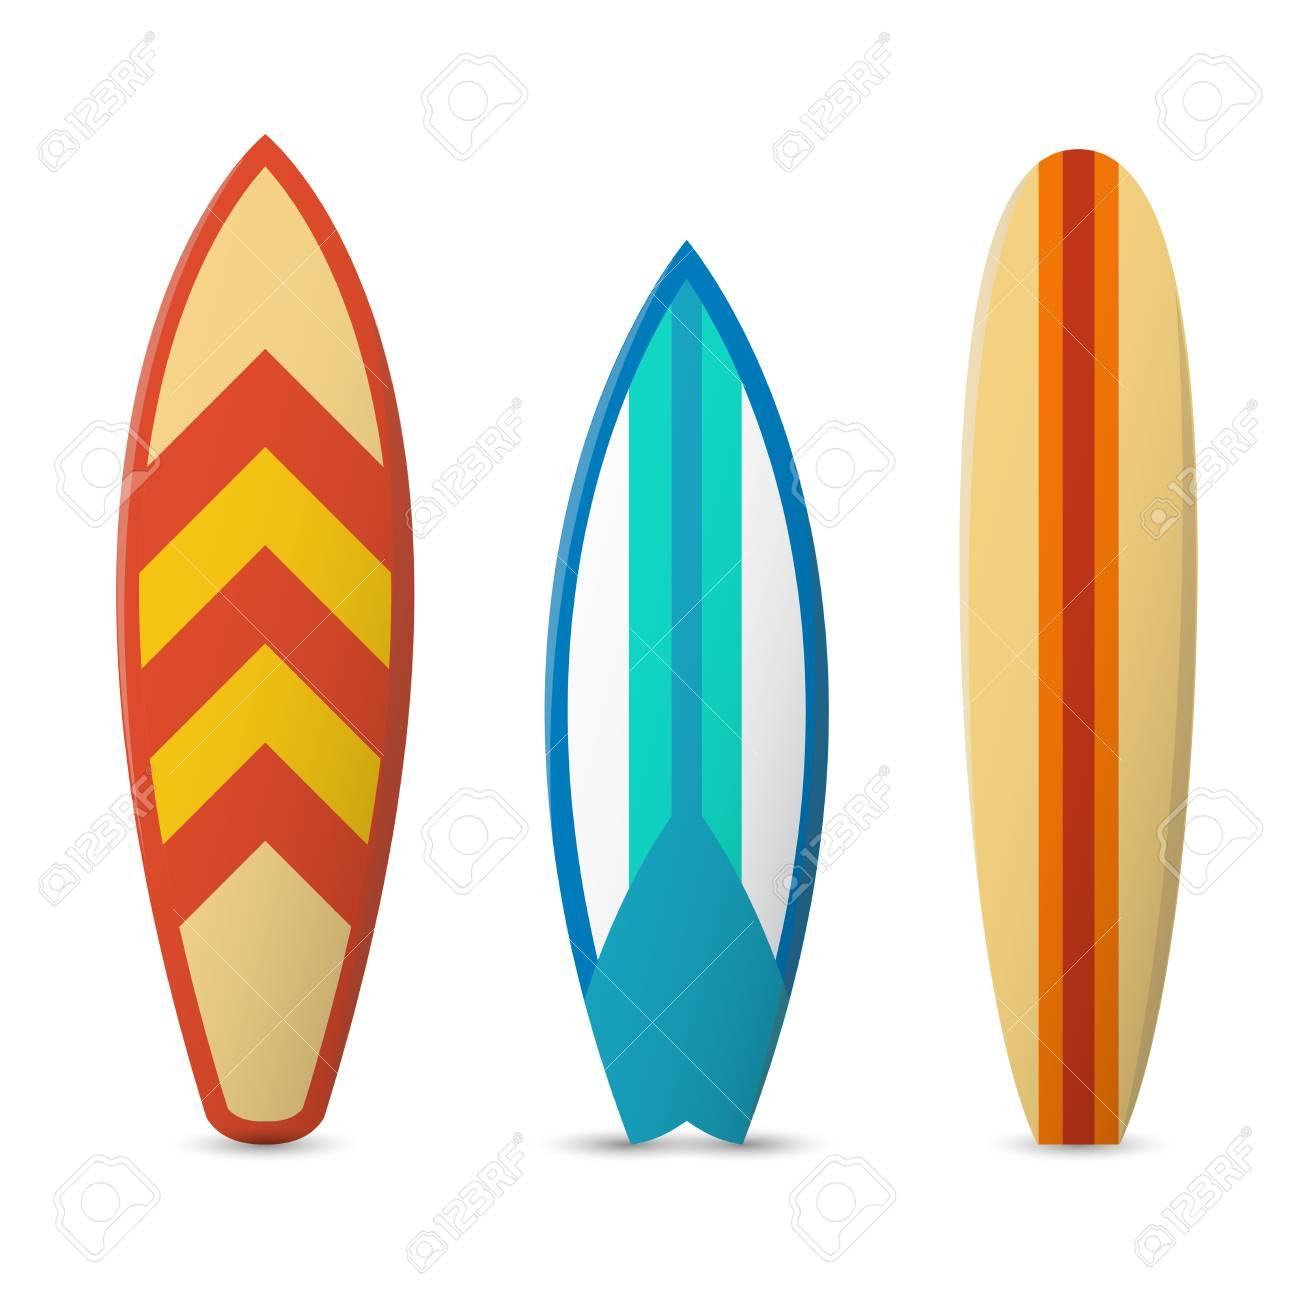 color surfboard set sea extreme sport pattern vector illustration rh 123rf com Surfboard Illustration Surfboard Illustration